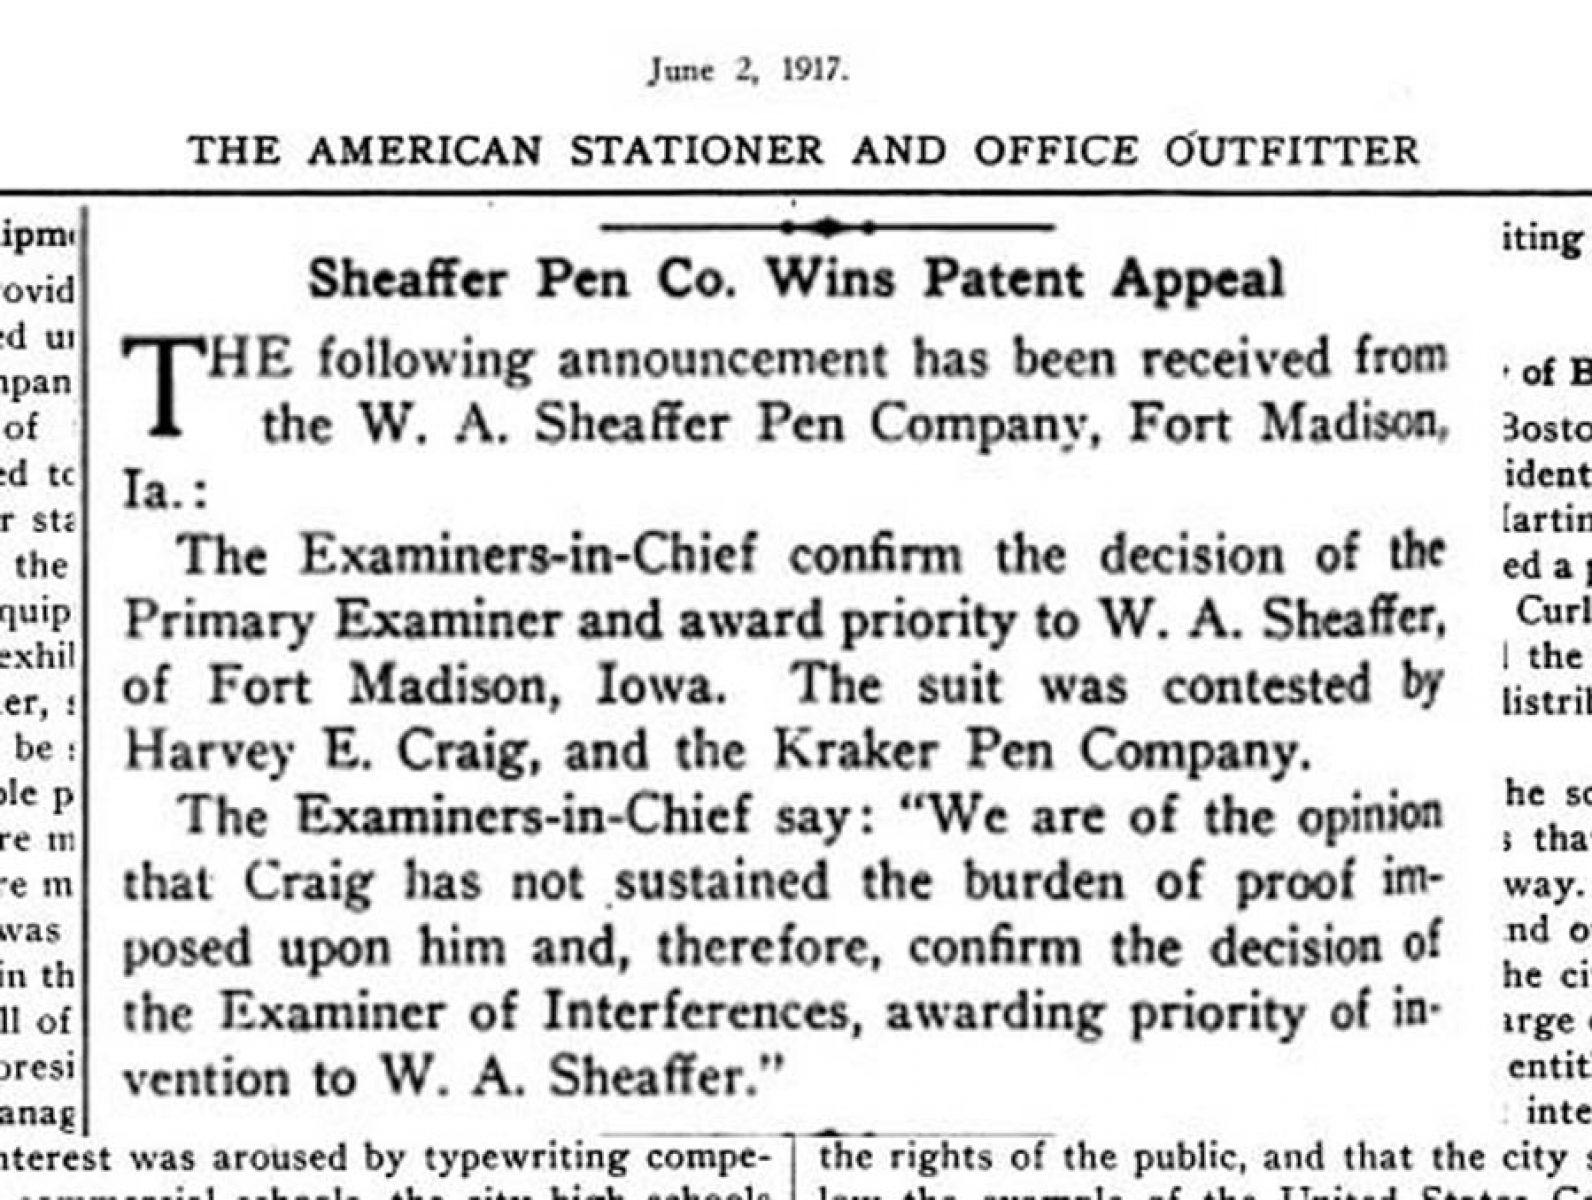 1917 06 02 Sheaffer wins patent appeal